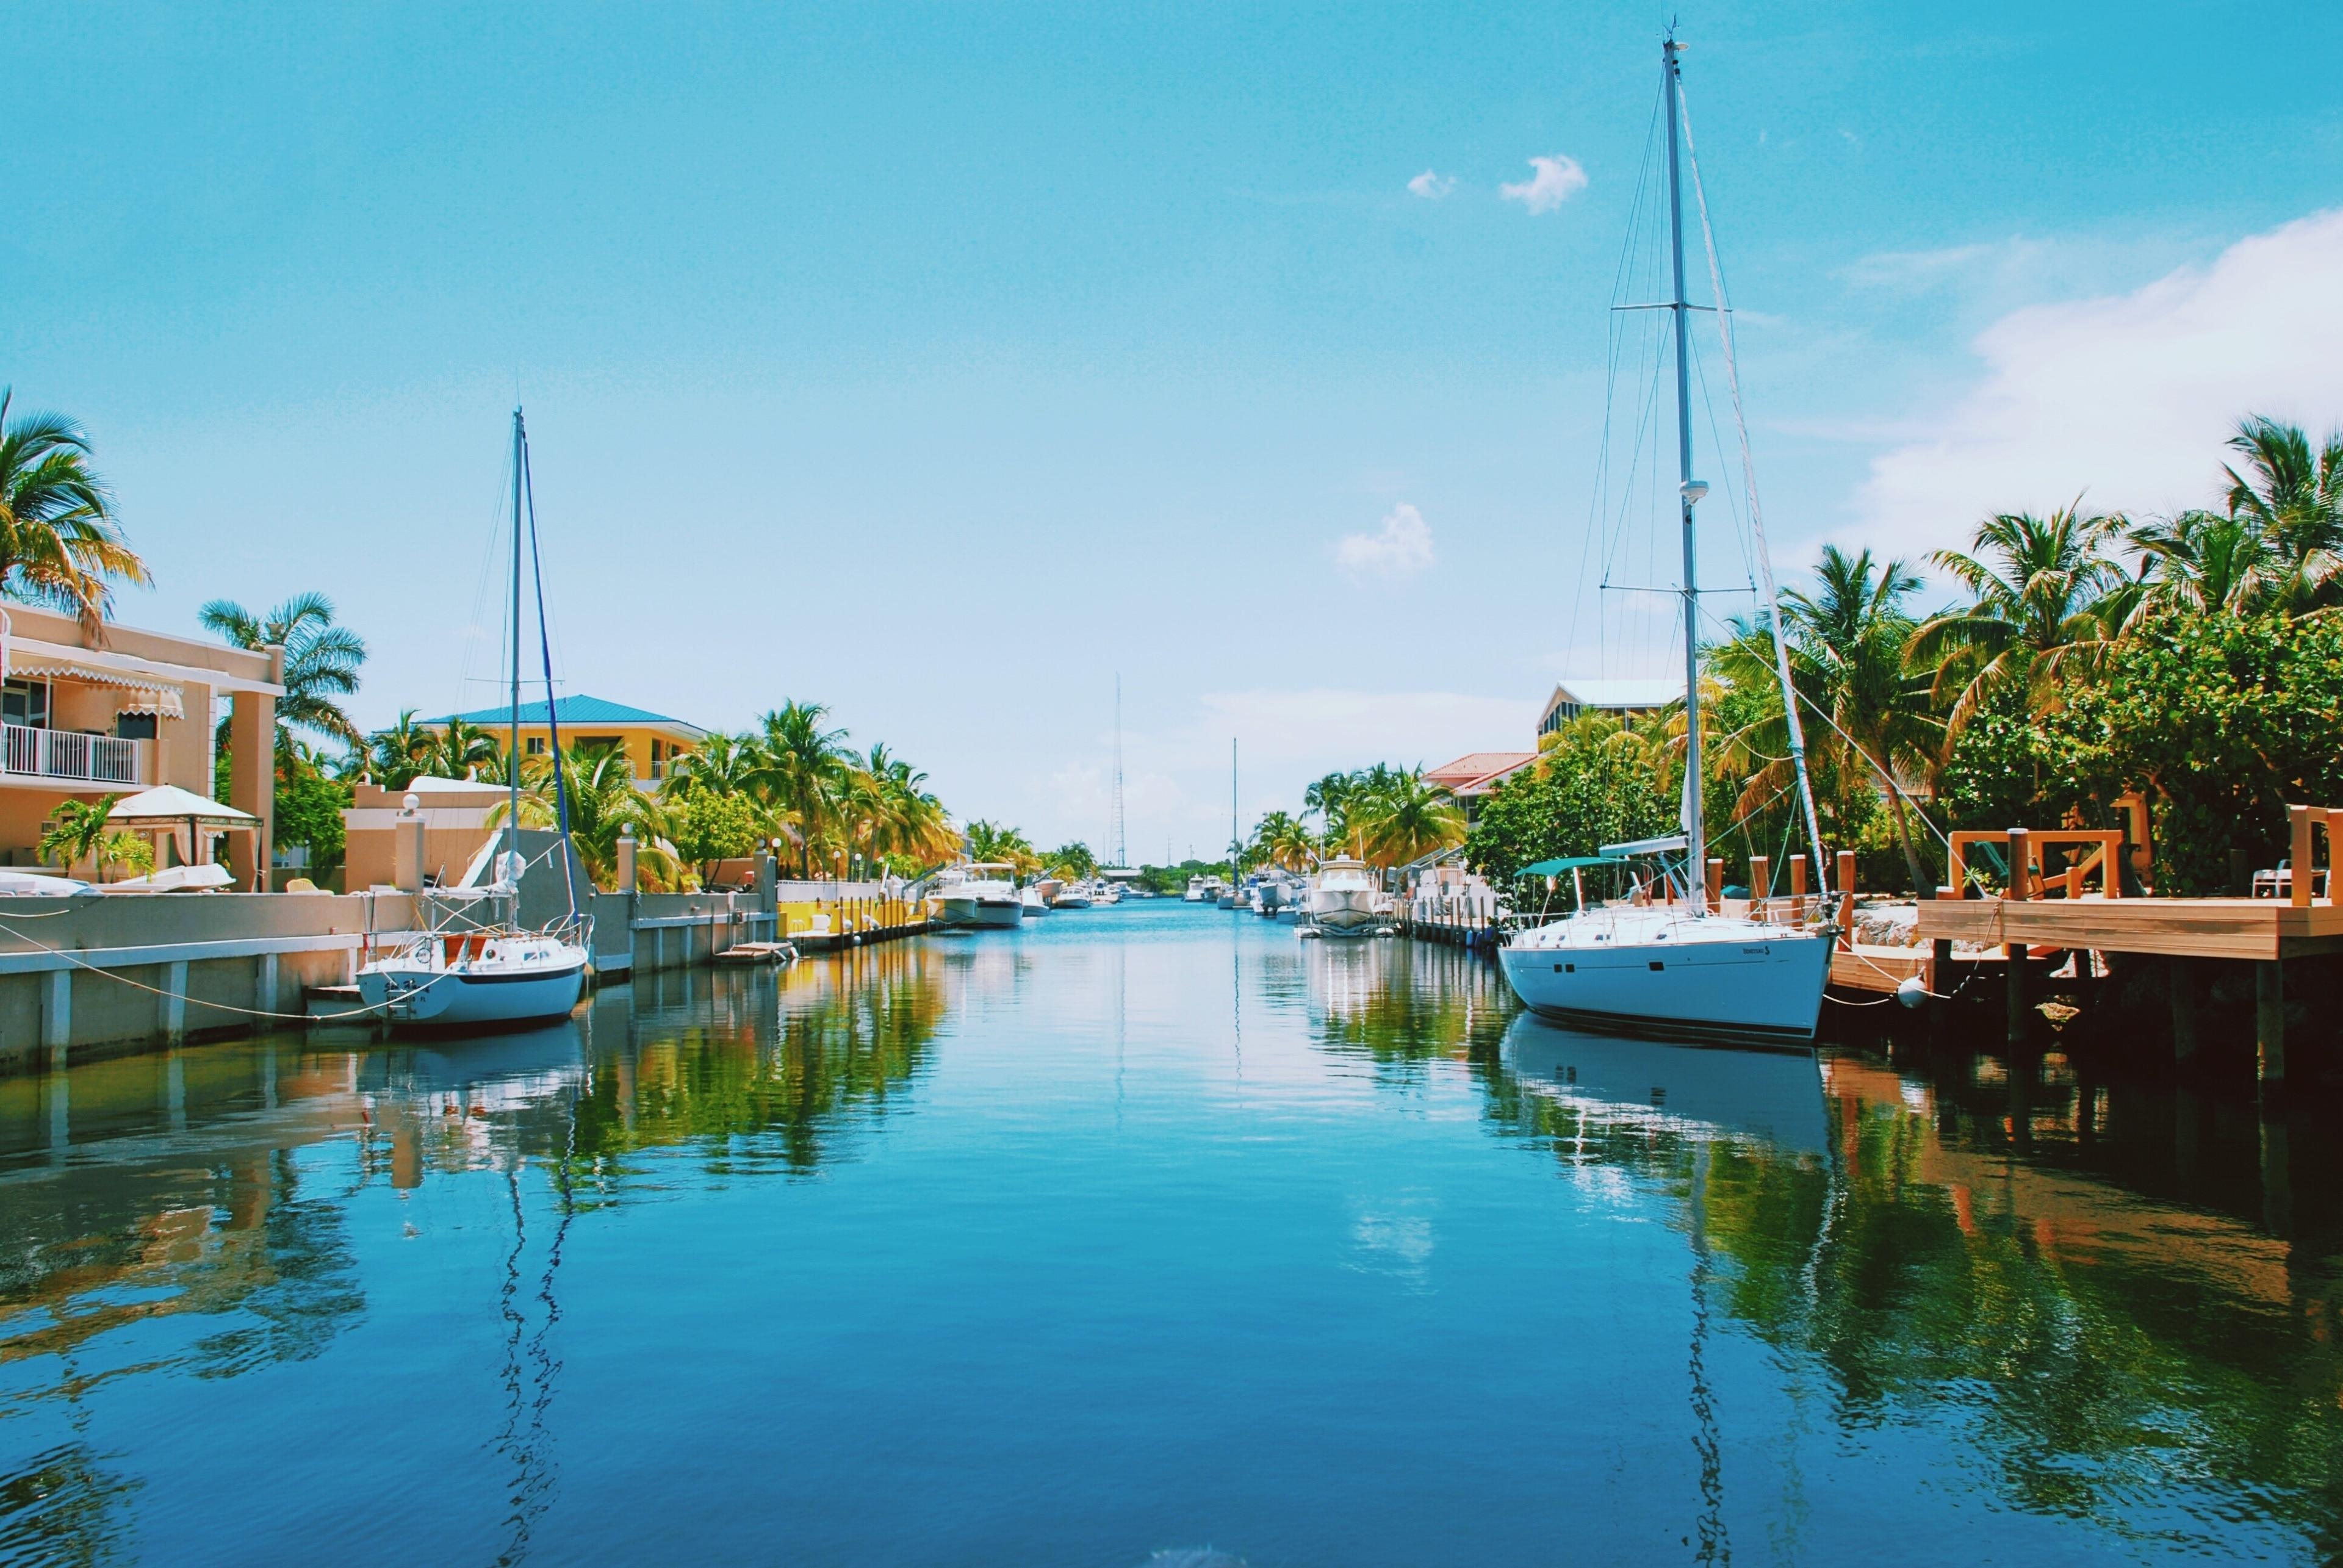 Hotels In Key West Last Minute Hotel Deals Key West Hotwire